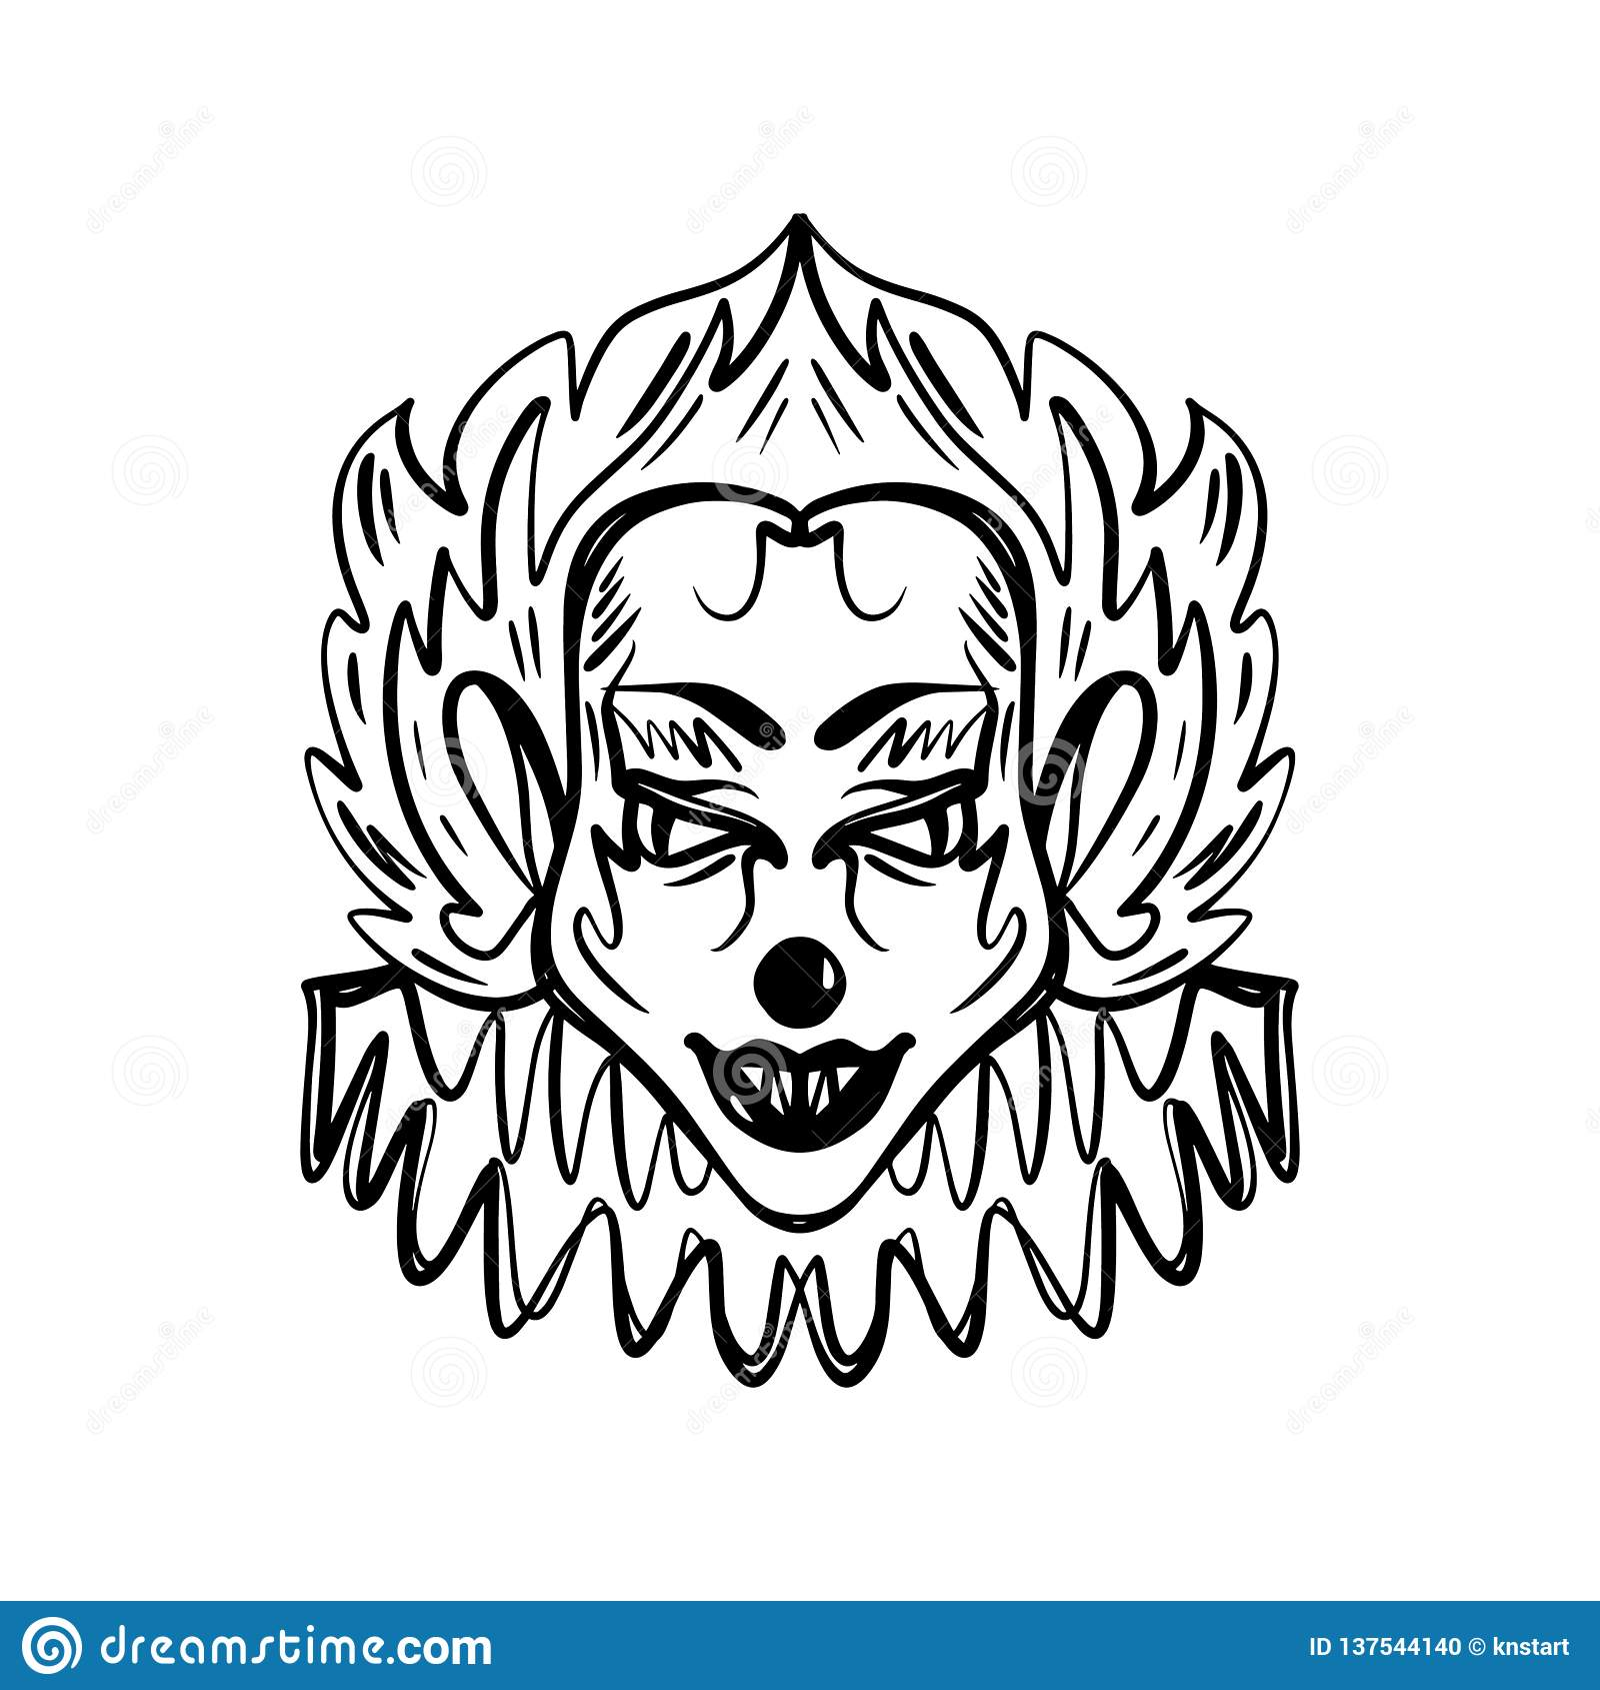 Evil clown art. Halloween mask illustration